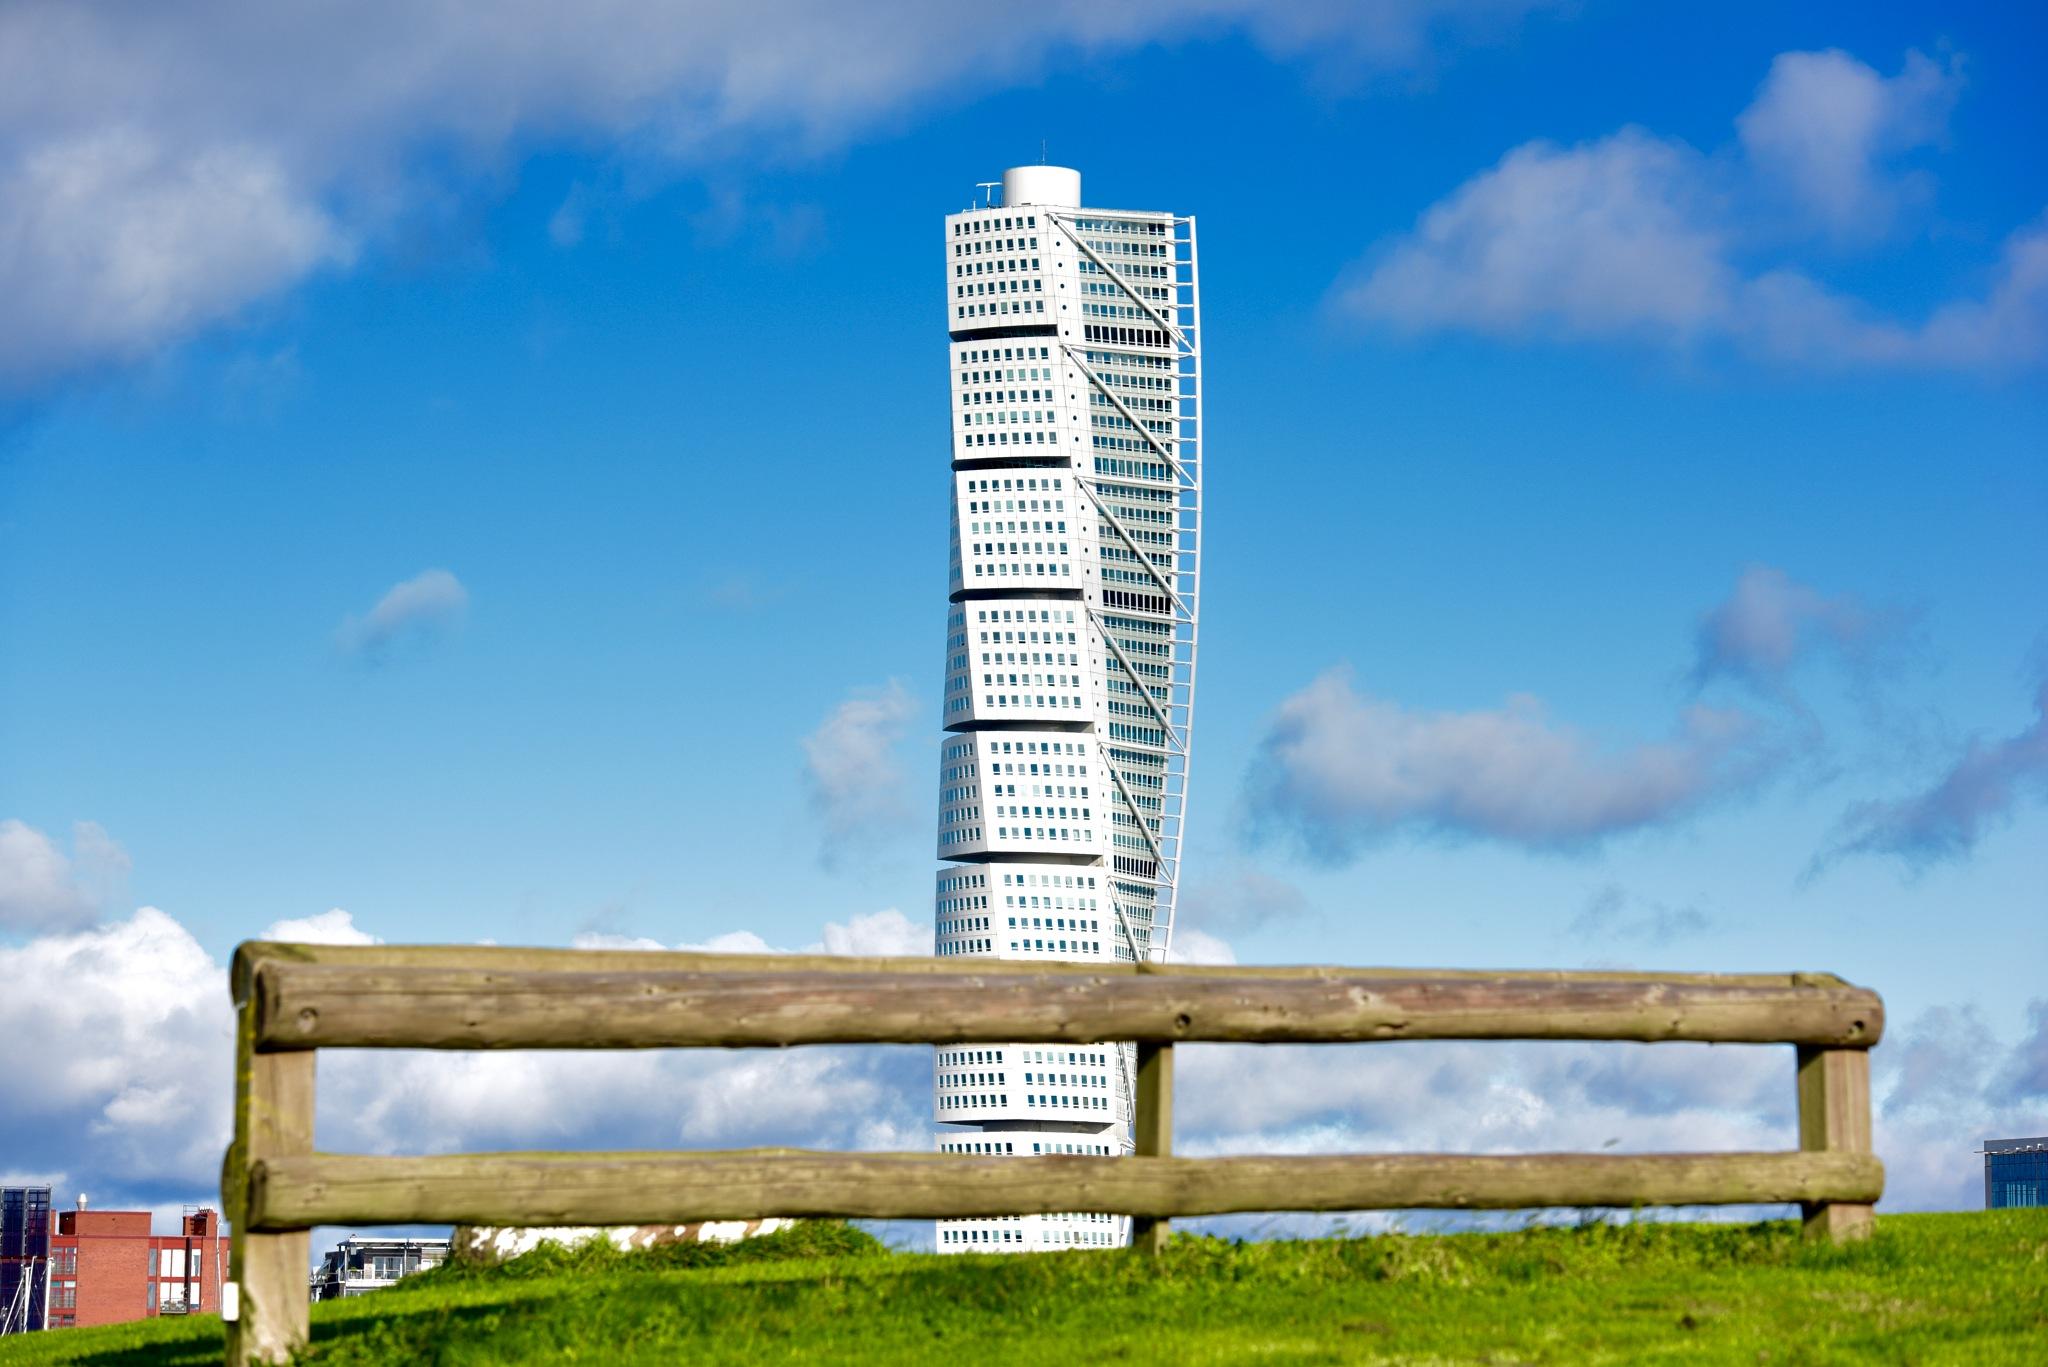 Malmö city 13! by Memed Bayatli